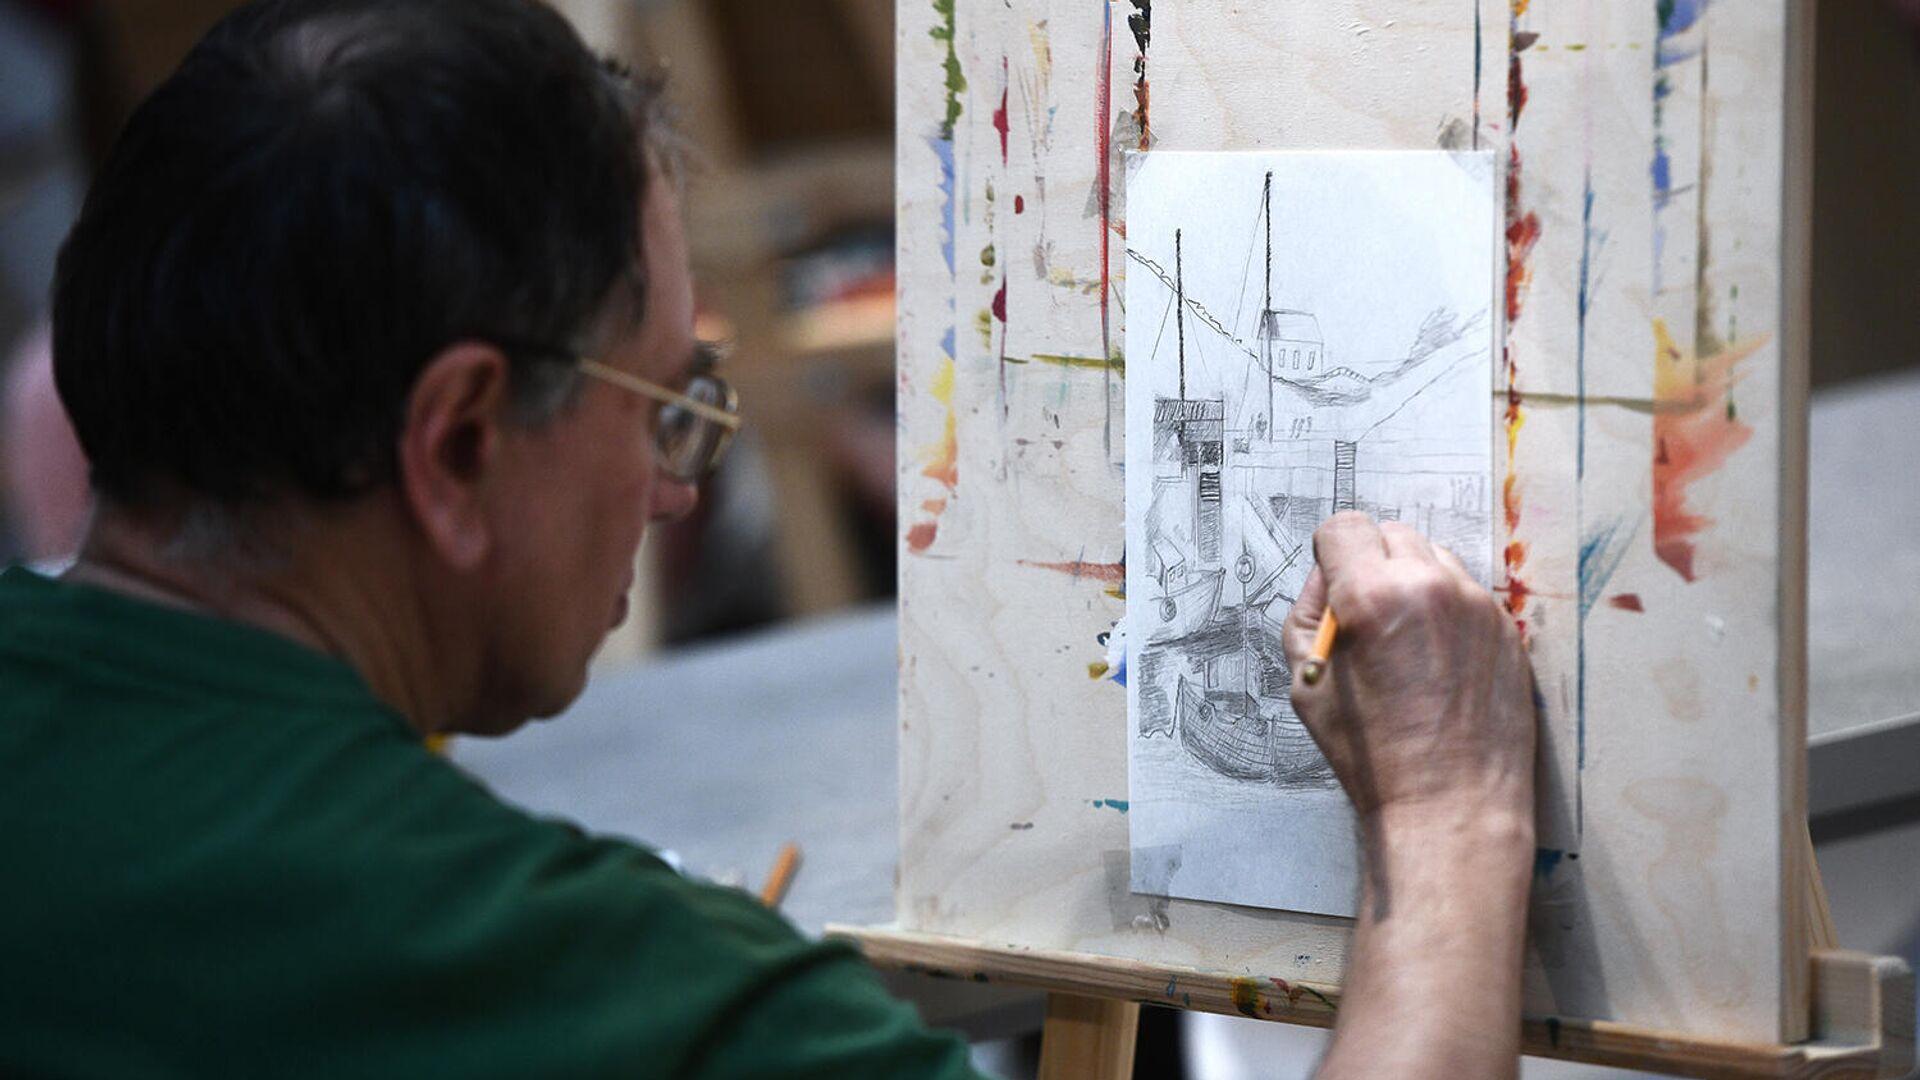 Мужчина рисует за мольбертом - РИА Новости, 1920, 21.11.2020